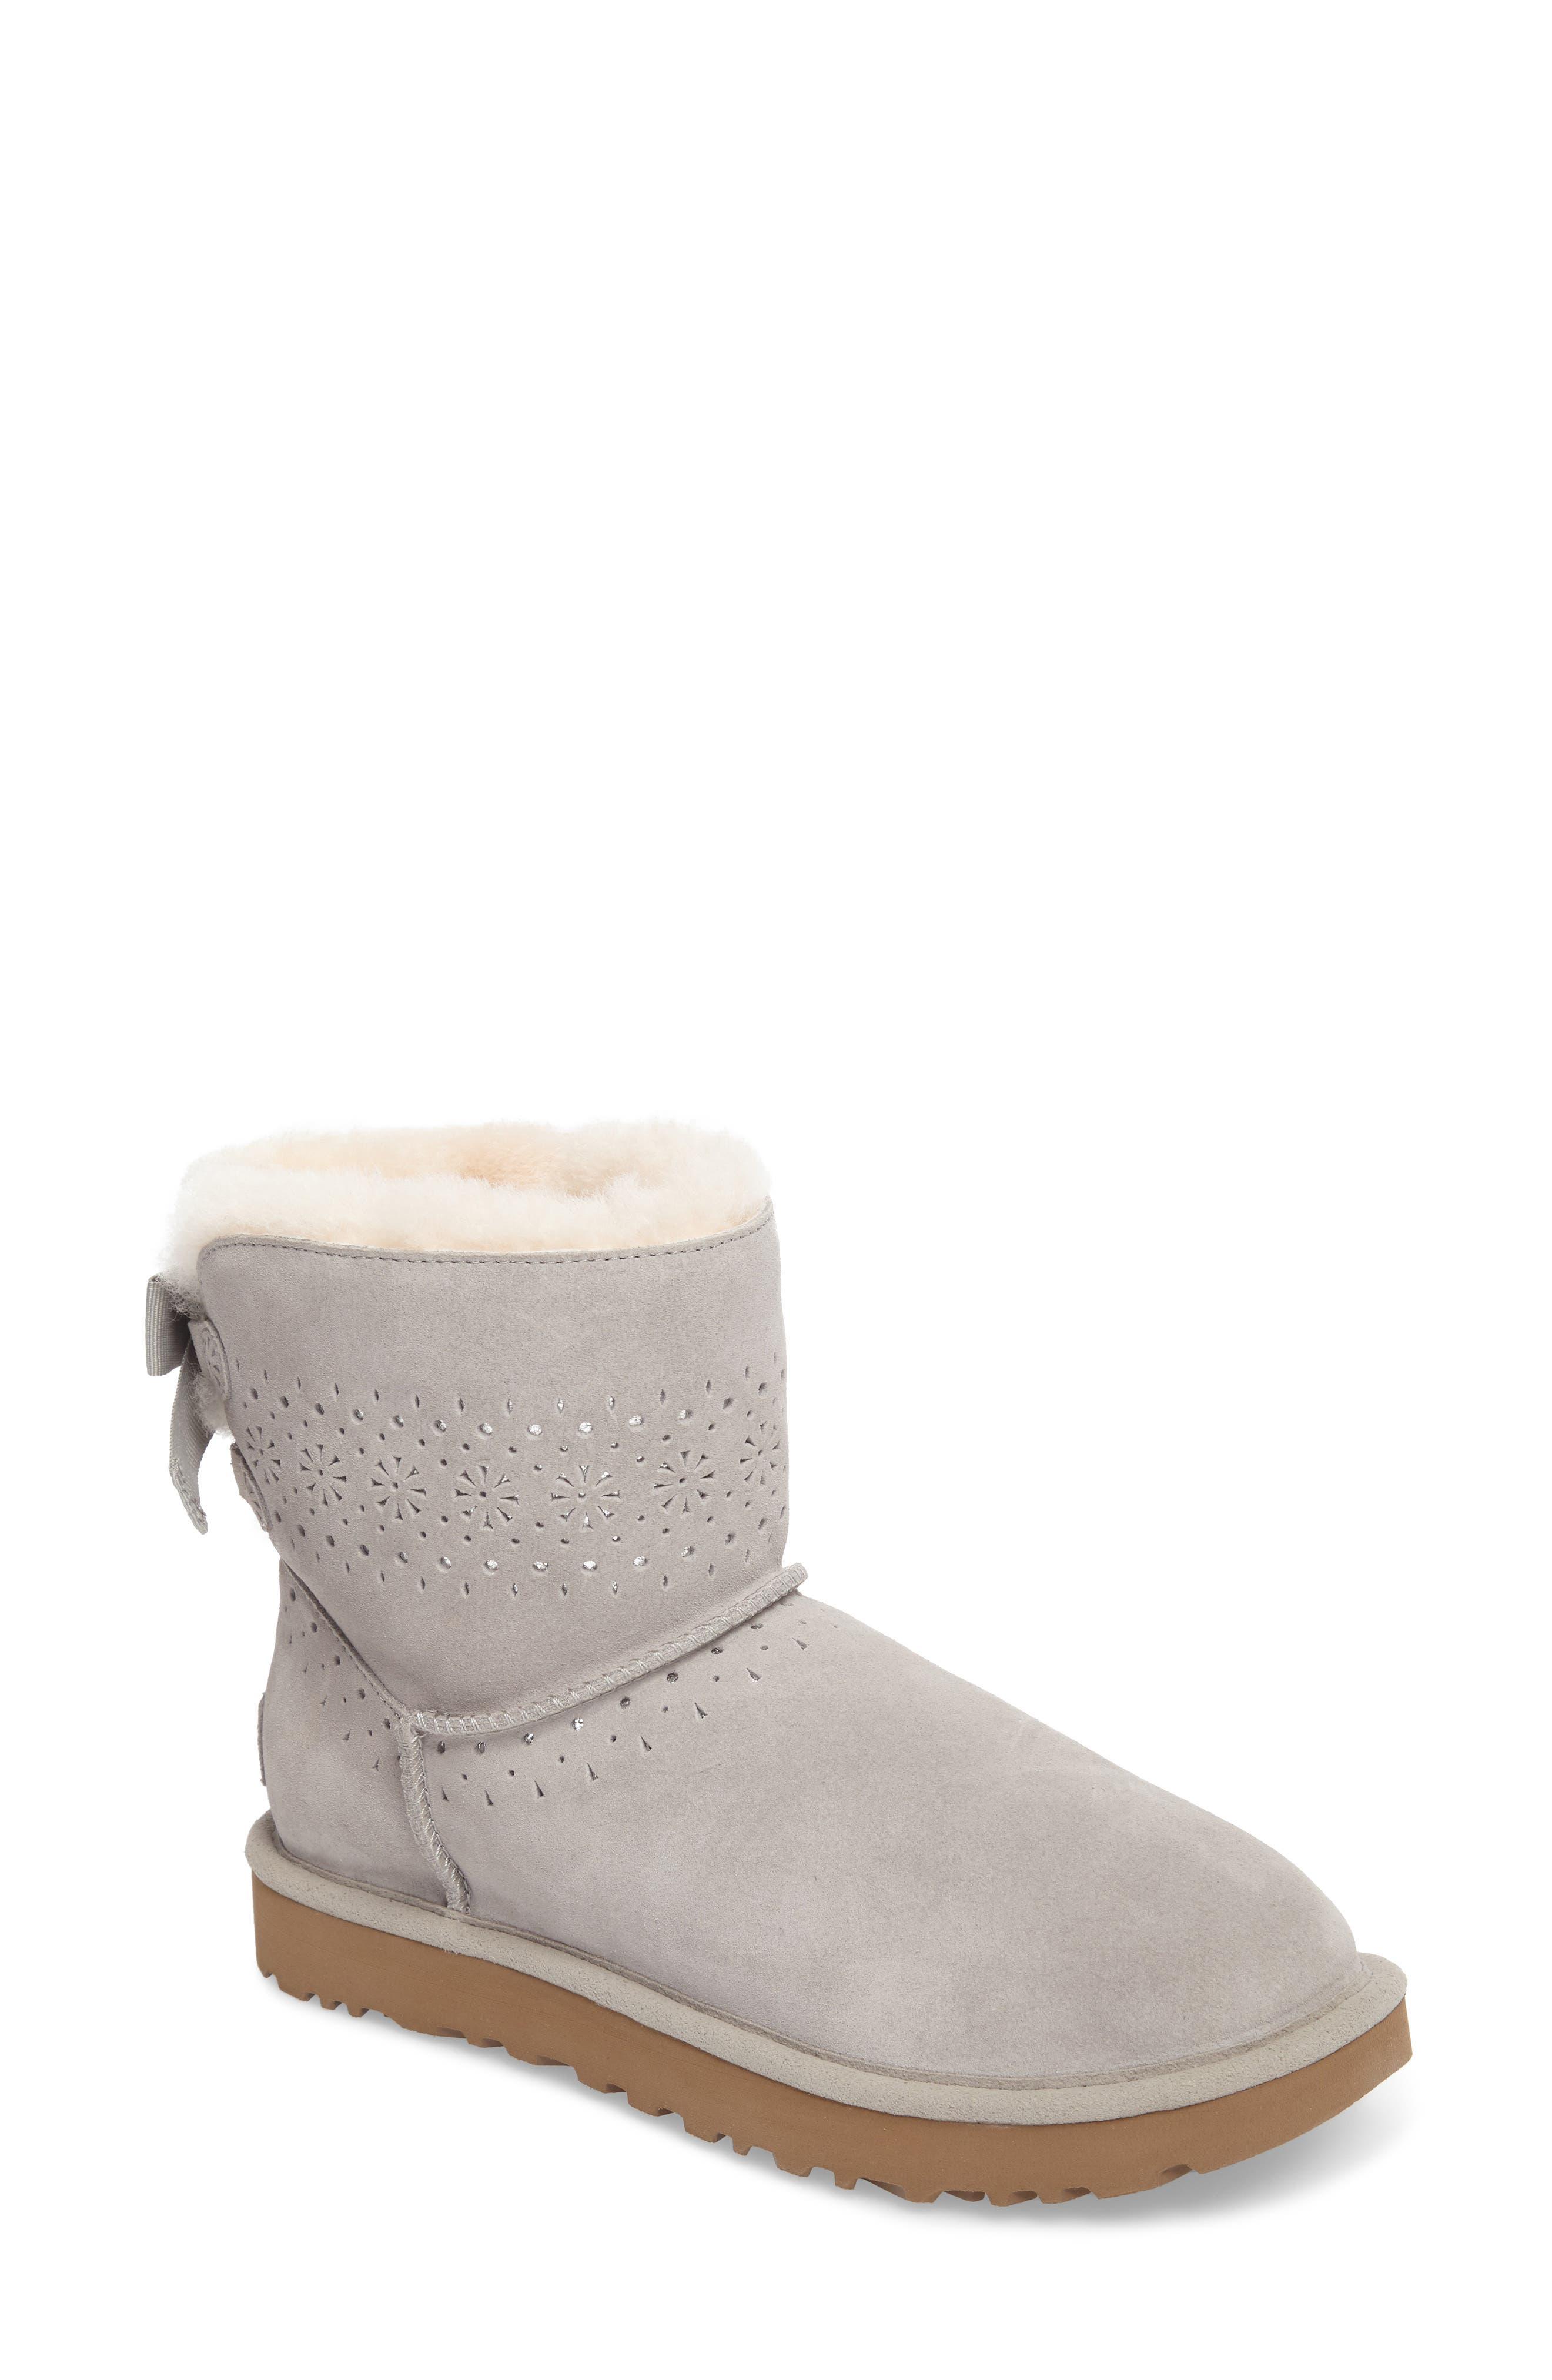 Dae Sunshine Boot,                         Main,                         color, 059